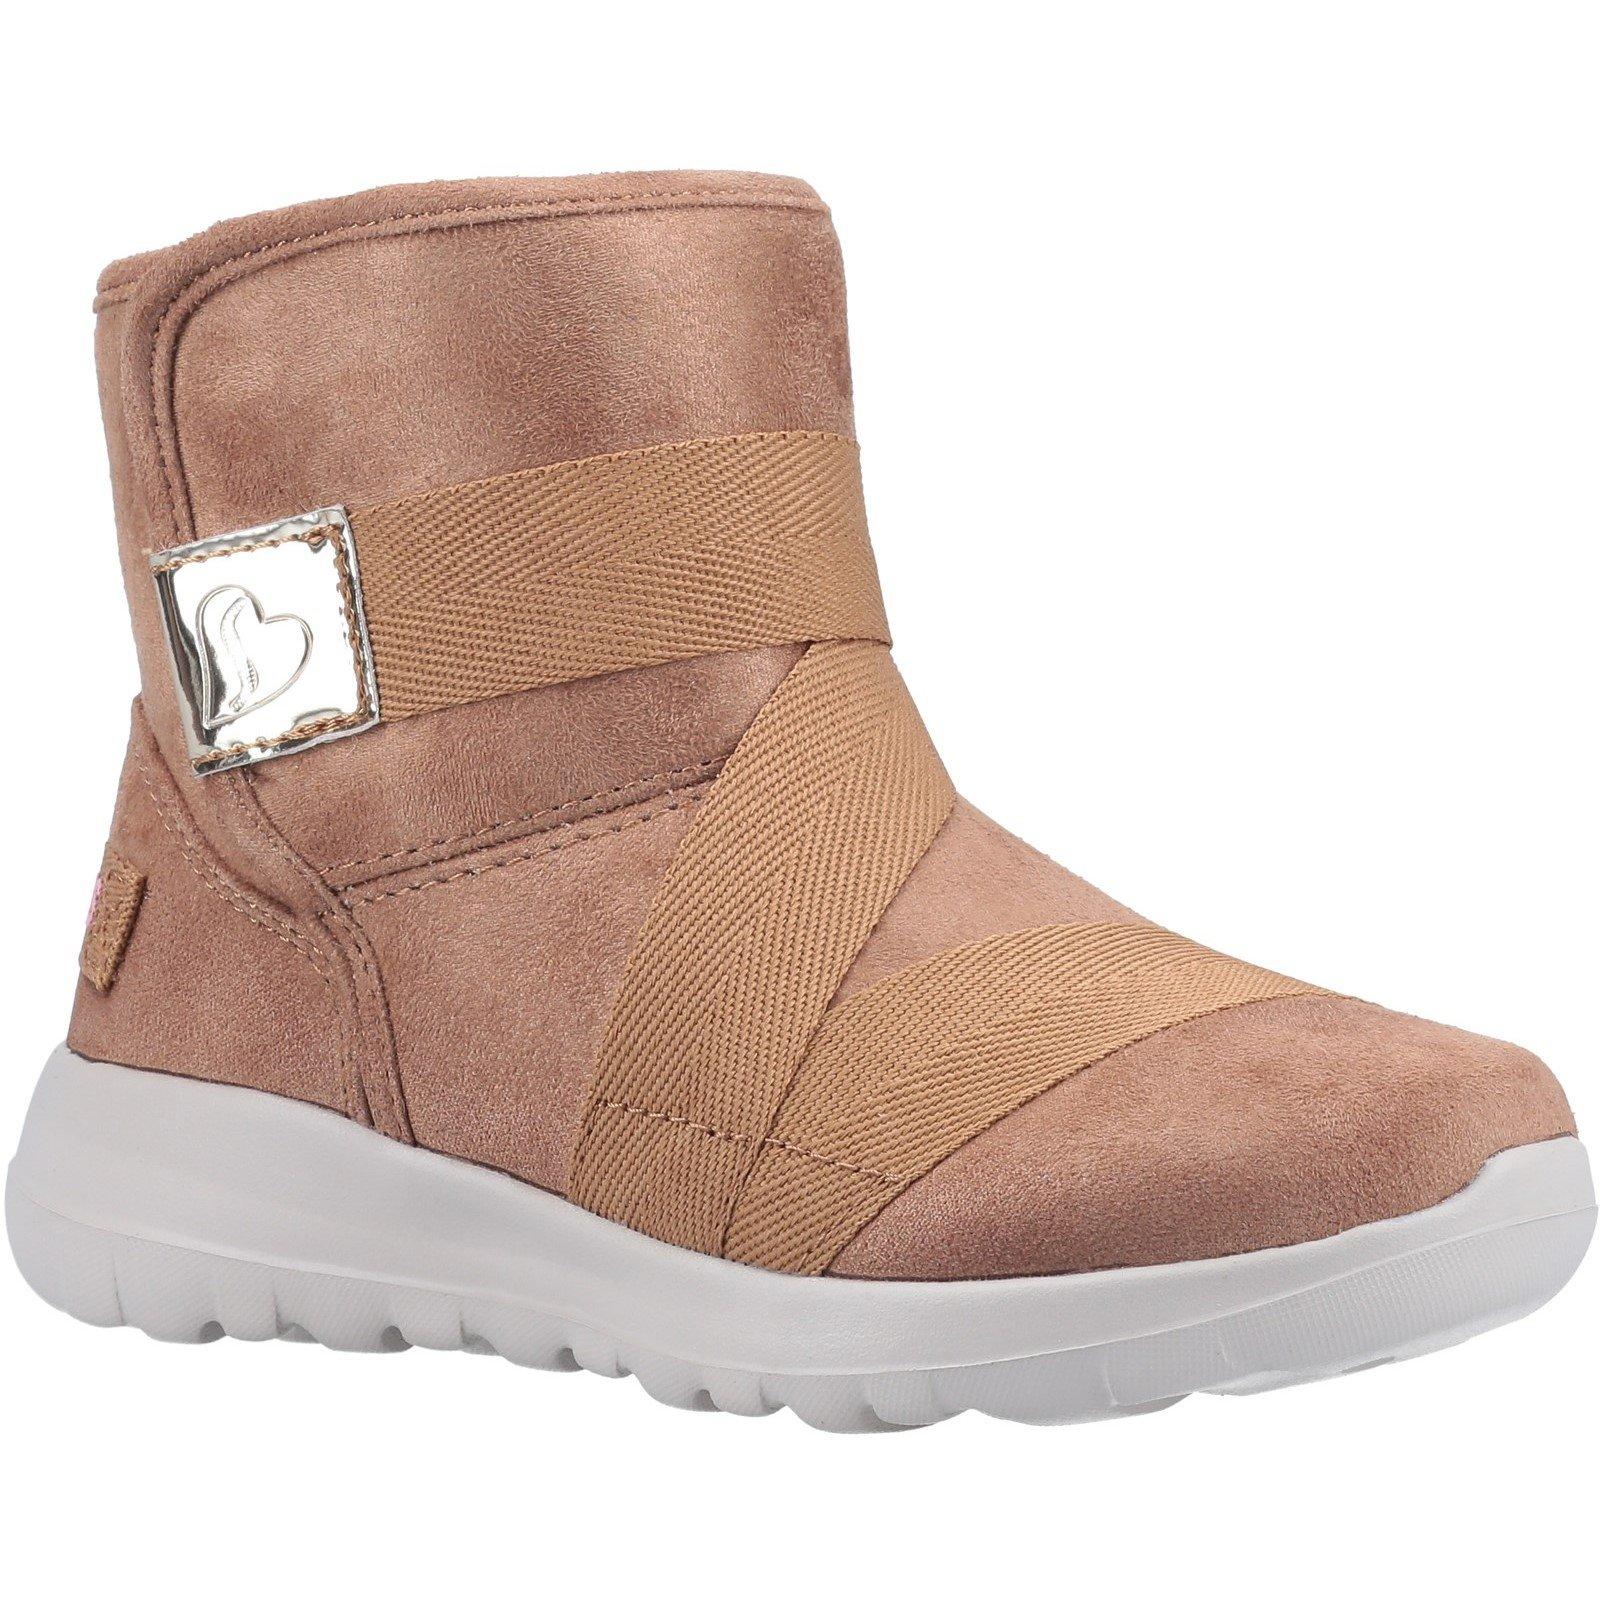 Skechers Unisex Go Walk Joy Strong Willed Ankle Boot Chestnut 31167 - Chestnut 13